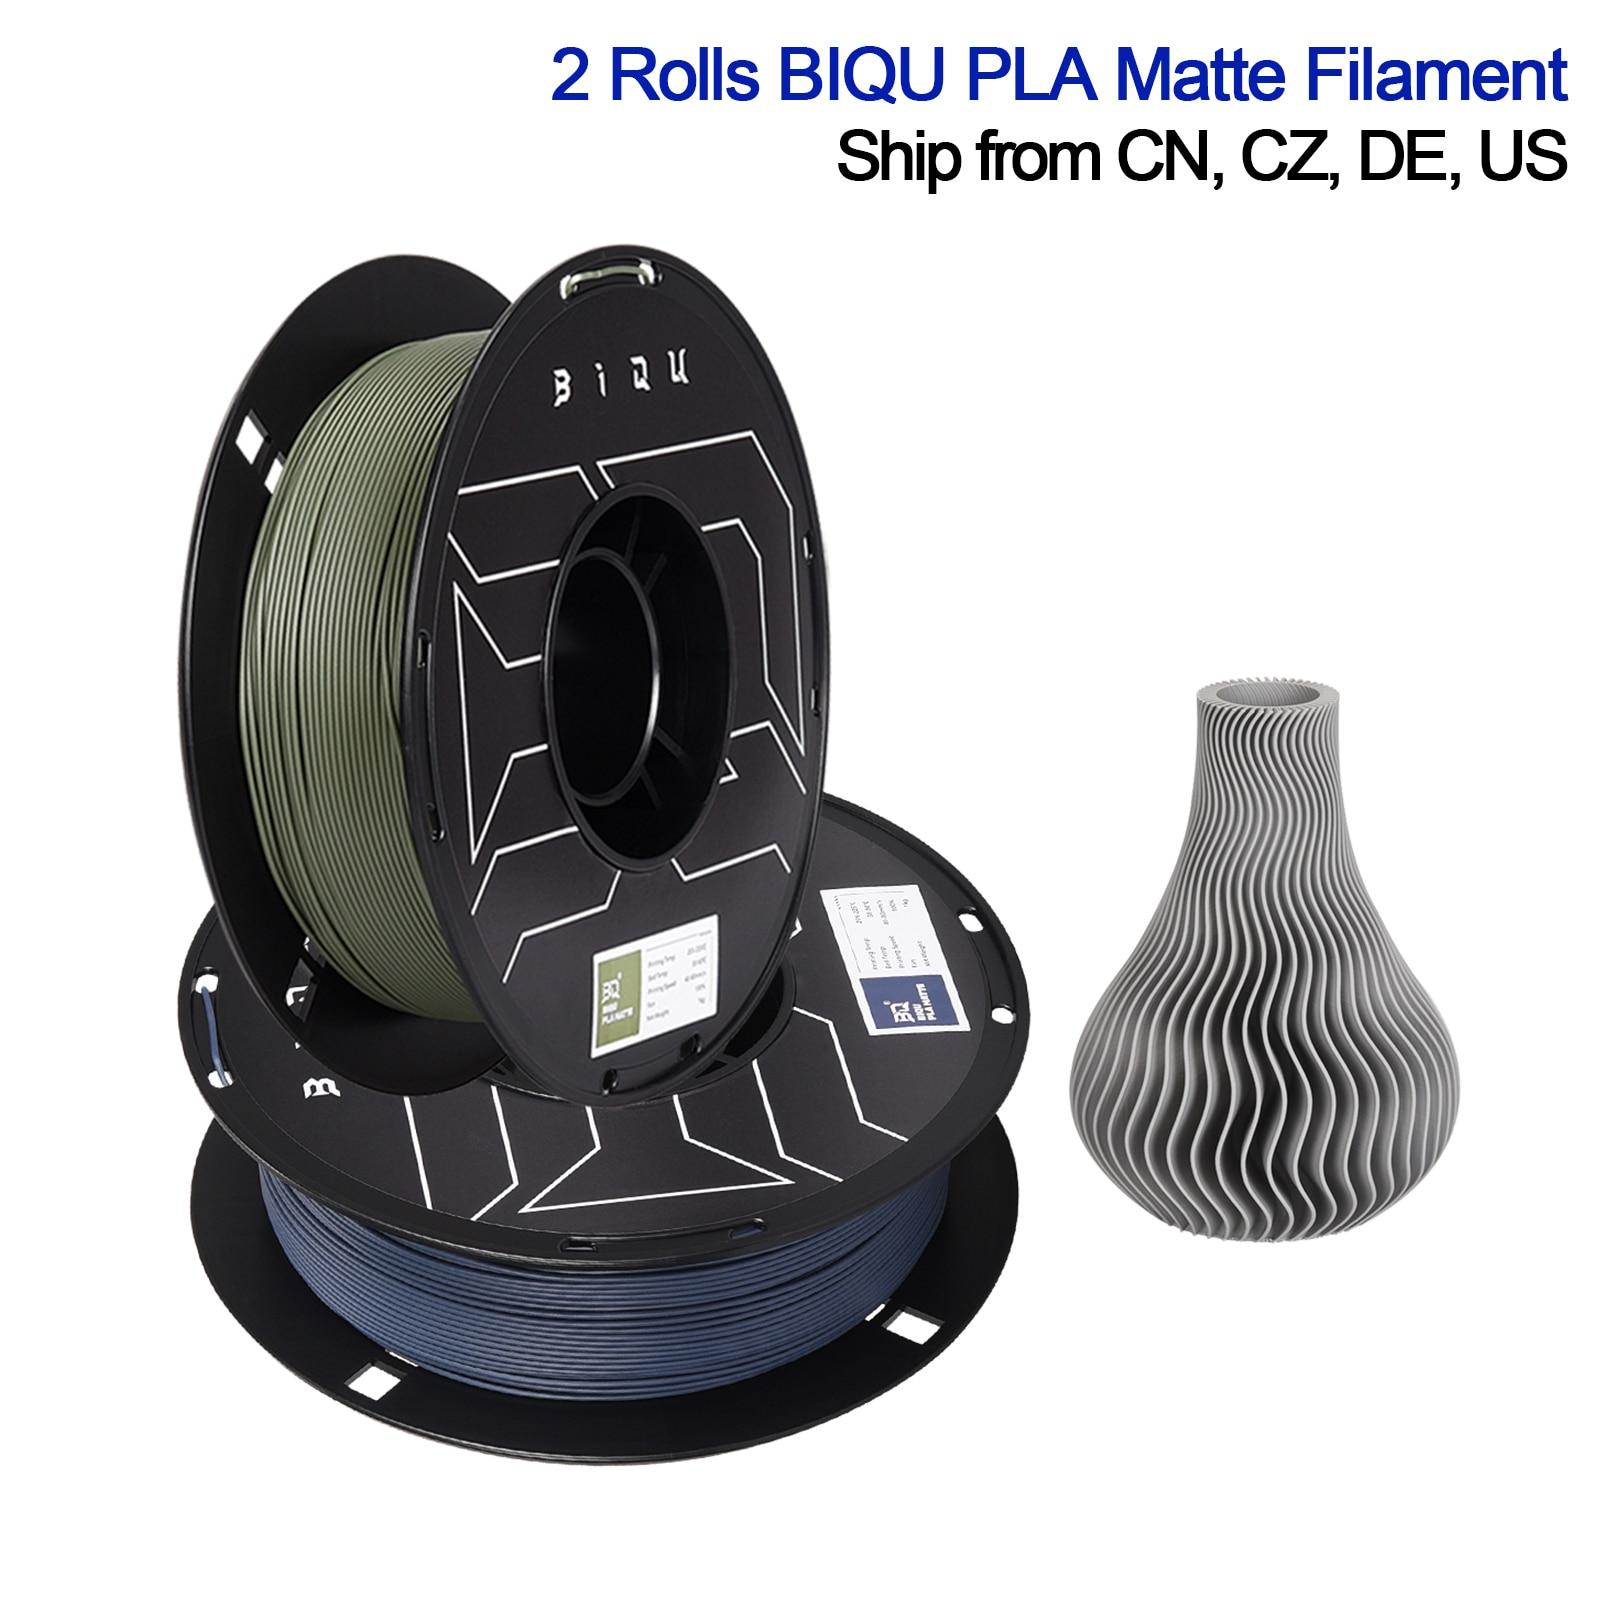 BIQU Matte Filament Review Navy Blue & Olive Green